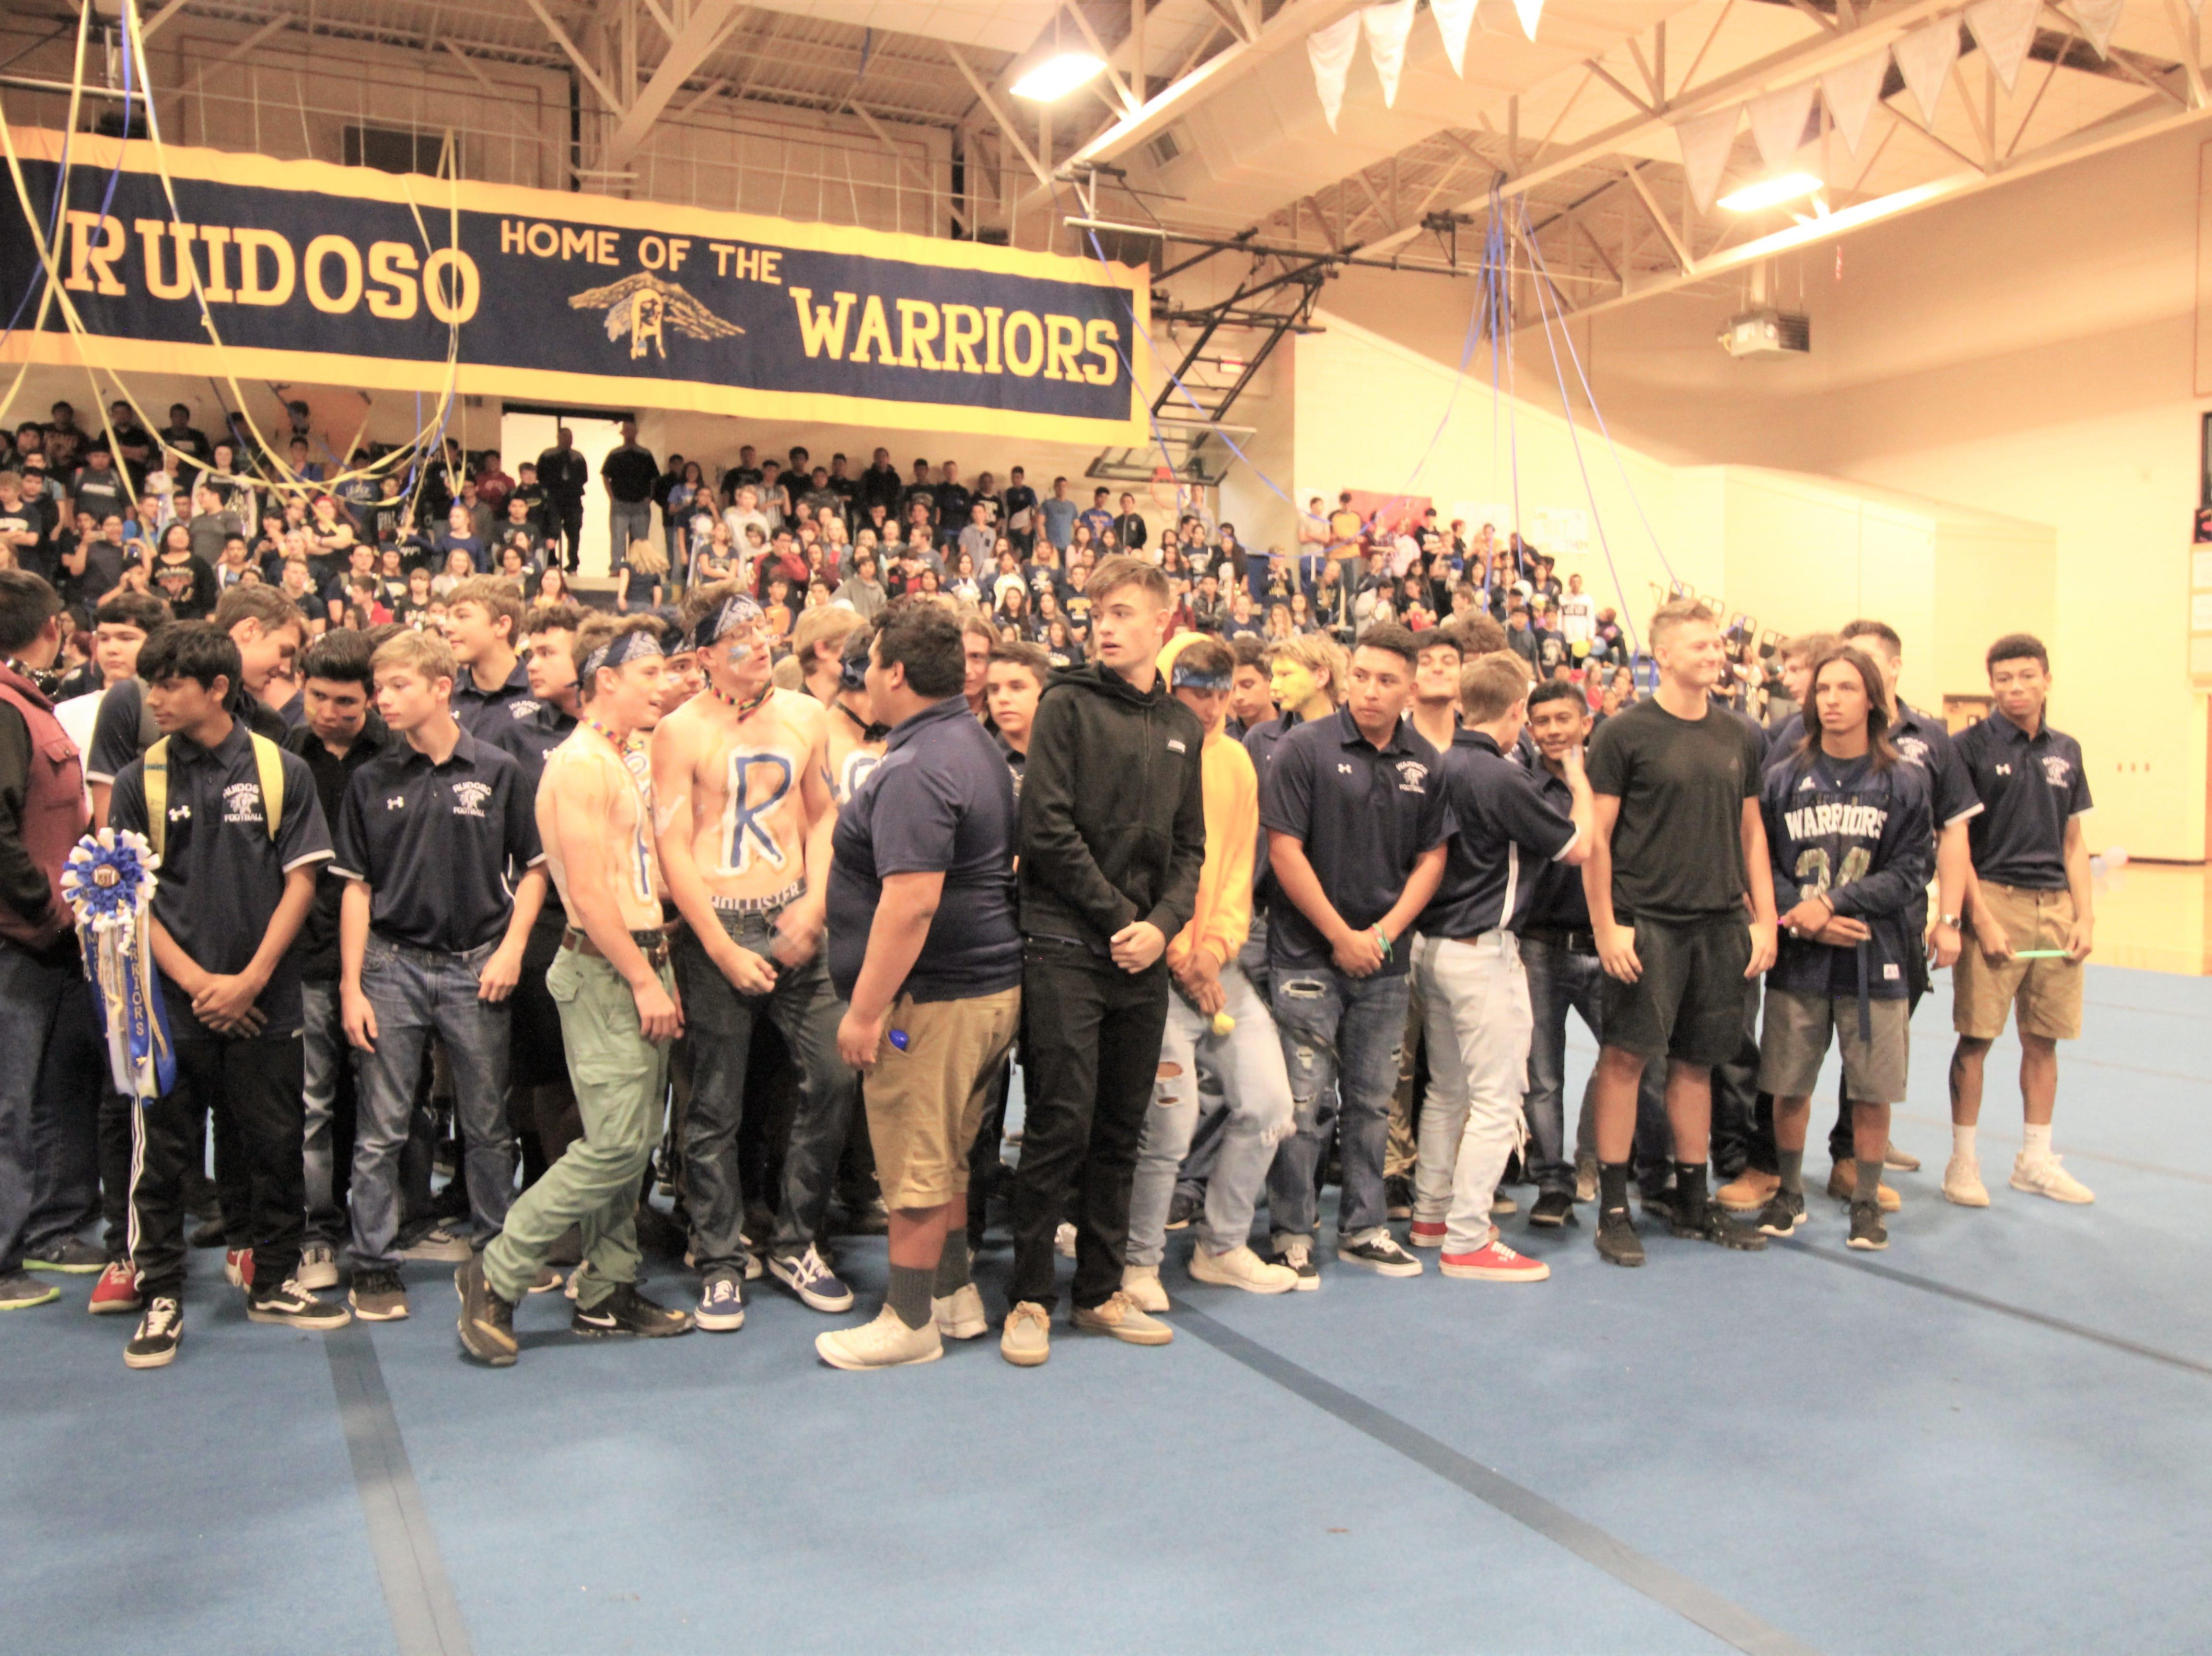 Ruidoso Warrior Football team at the 2018 pep rally. Go Warriors!